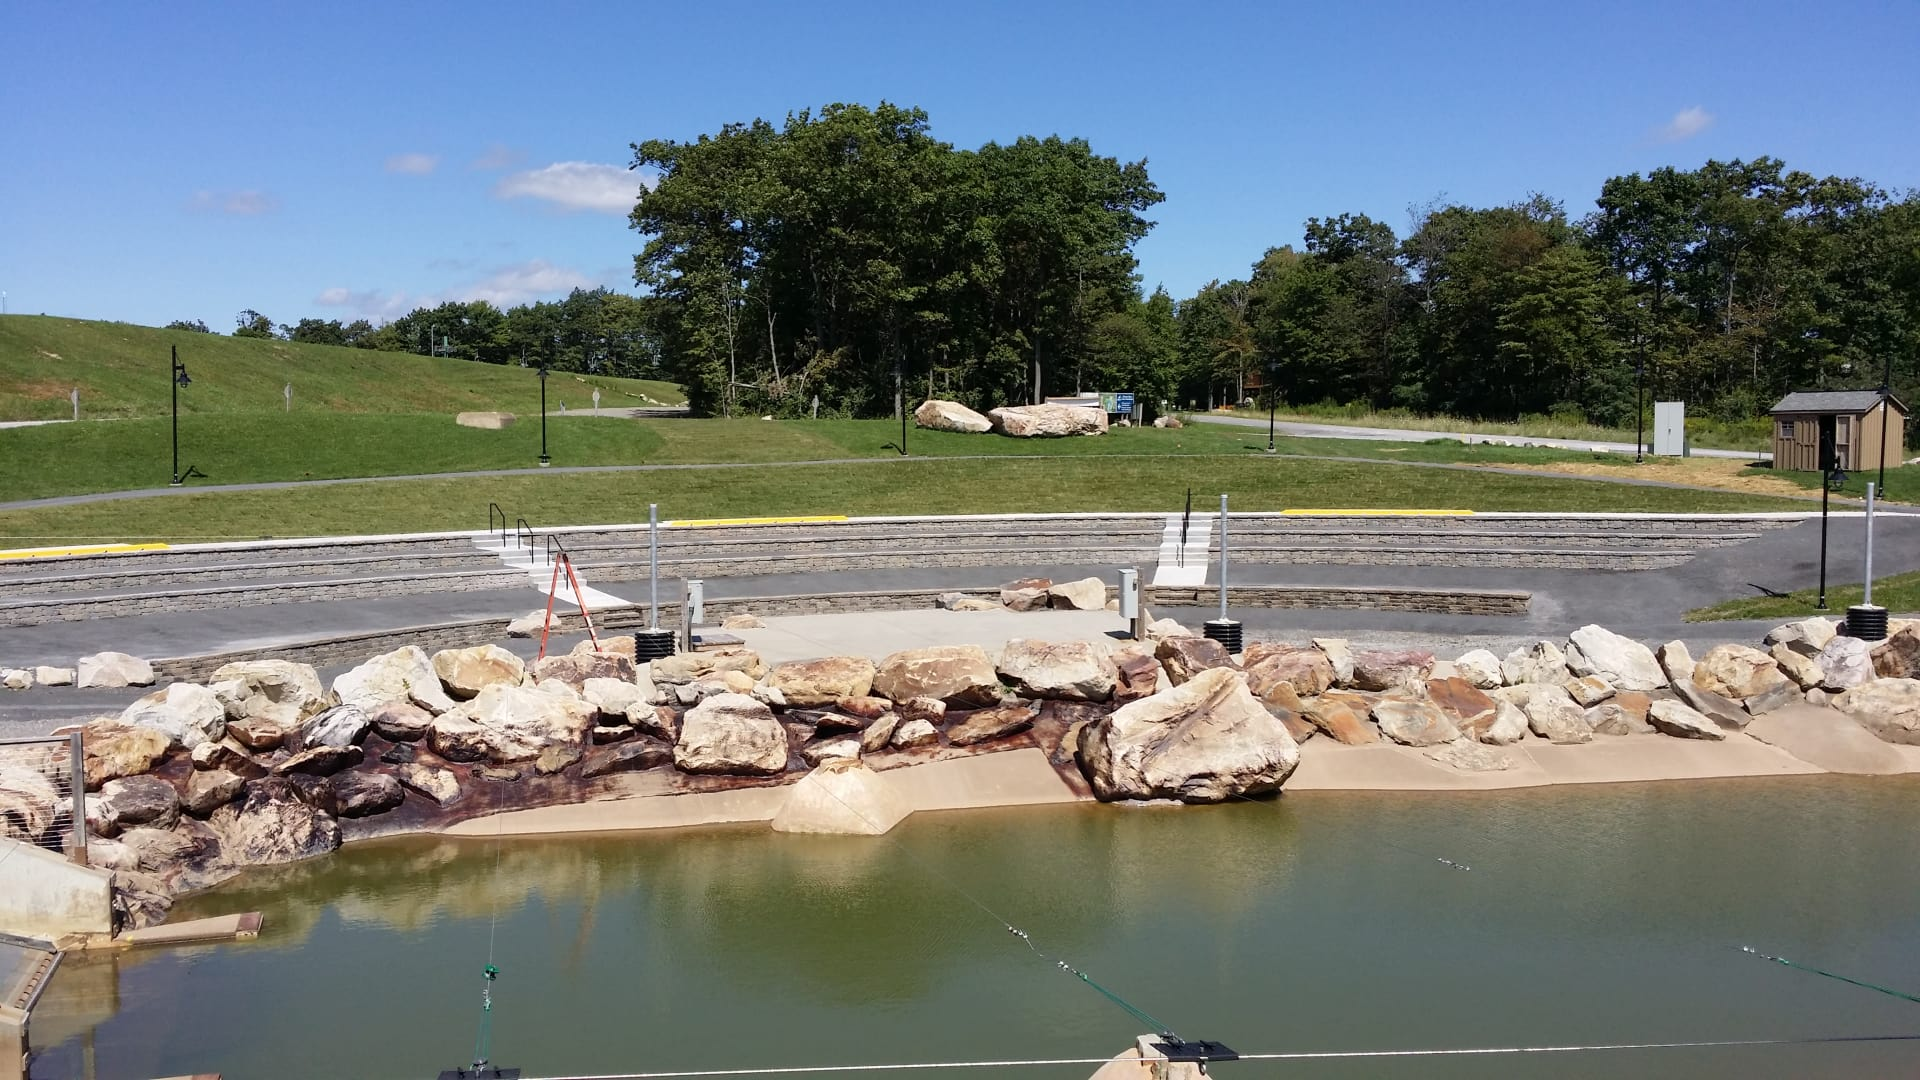 ASCI_Infrastructure_Improvements_Amphitheater_Photo_C_Sharon_2014_08_28-w1920.jpg